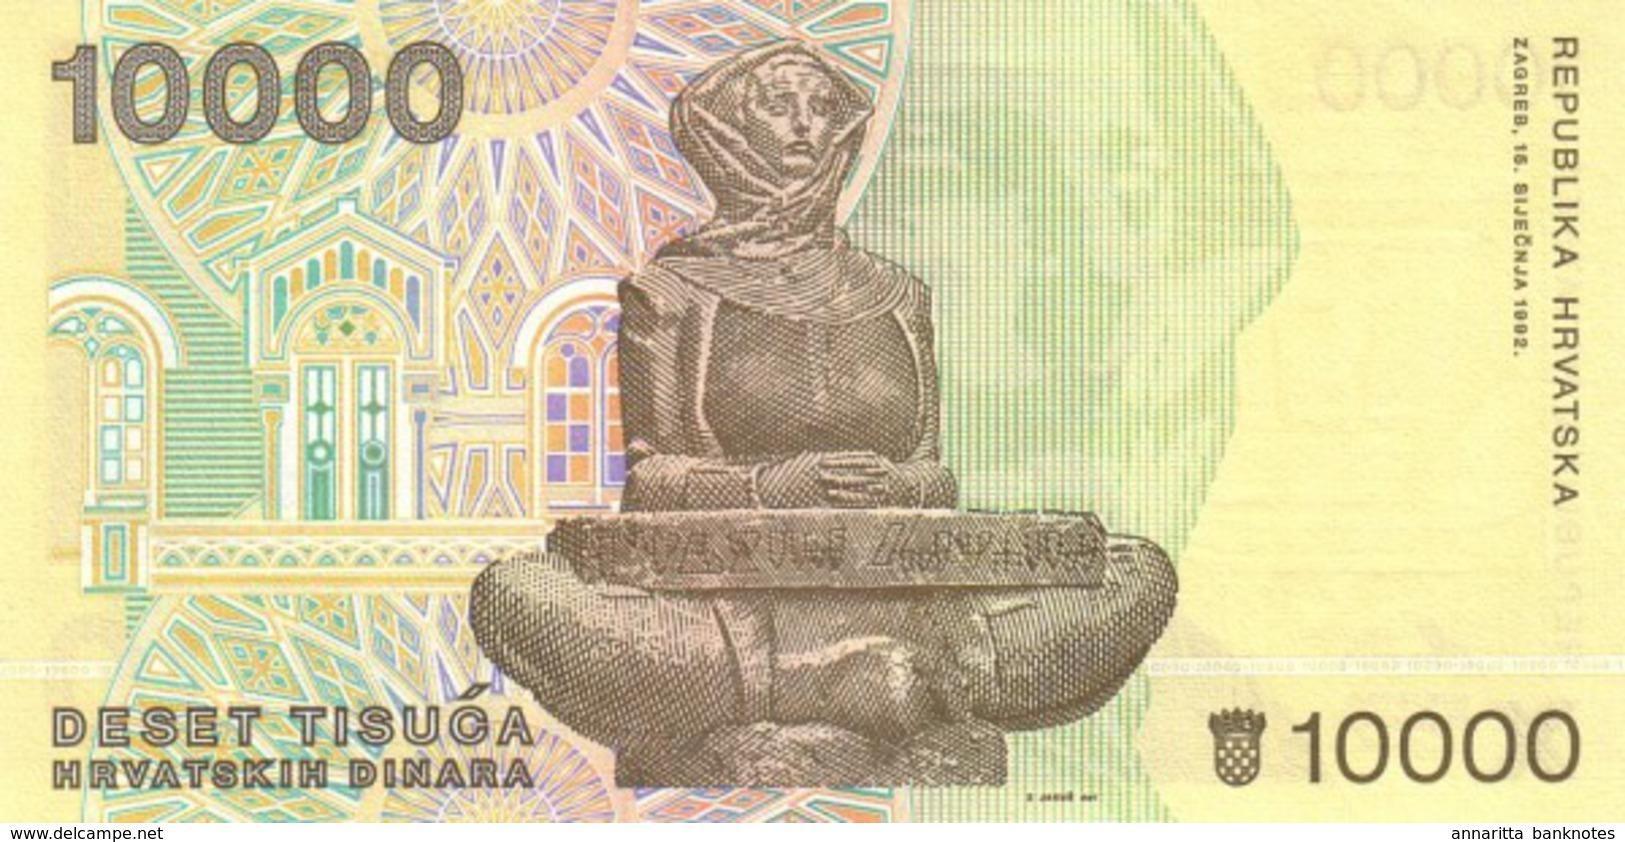 CROATIA 10000 DINARS 1992 P-25 UNC [ HR310a ] - Croatia